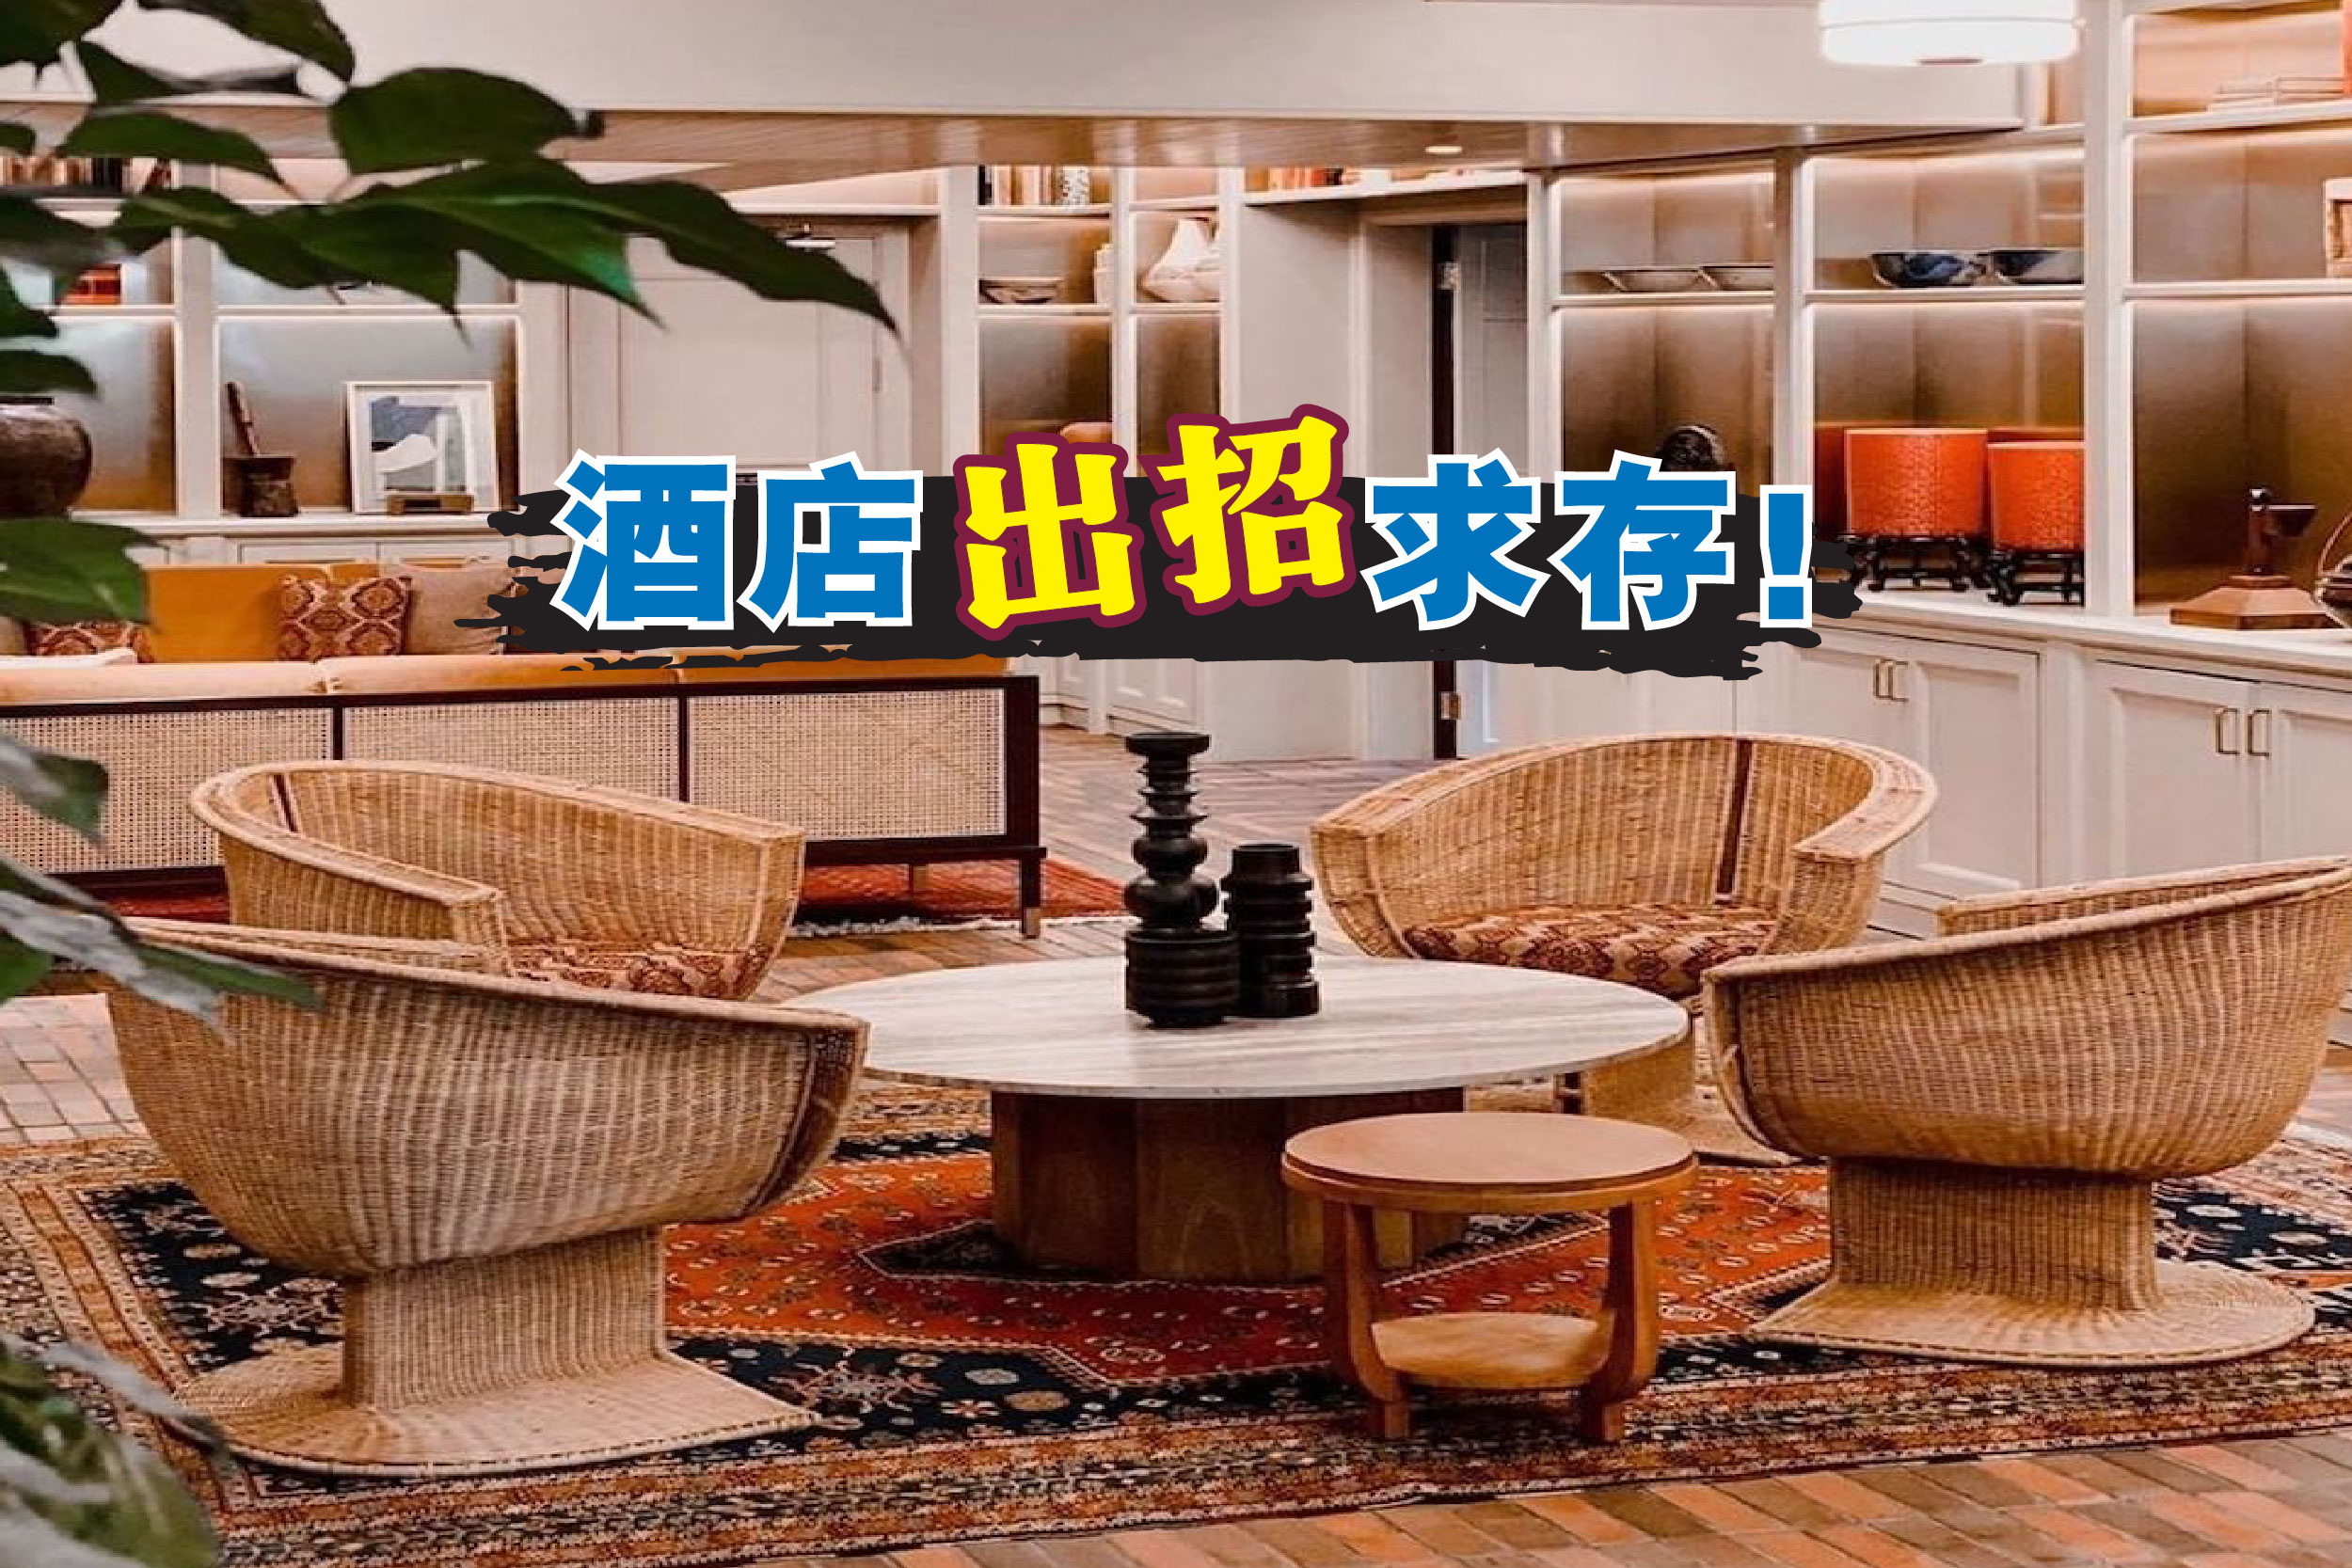 "酒店业者把""Work From Home""变成""Work From Hotel"",祭出各种配套求存。-图取自Ormond Hotels Instagram,精彩大马制图-"